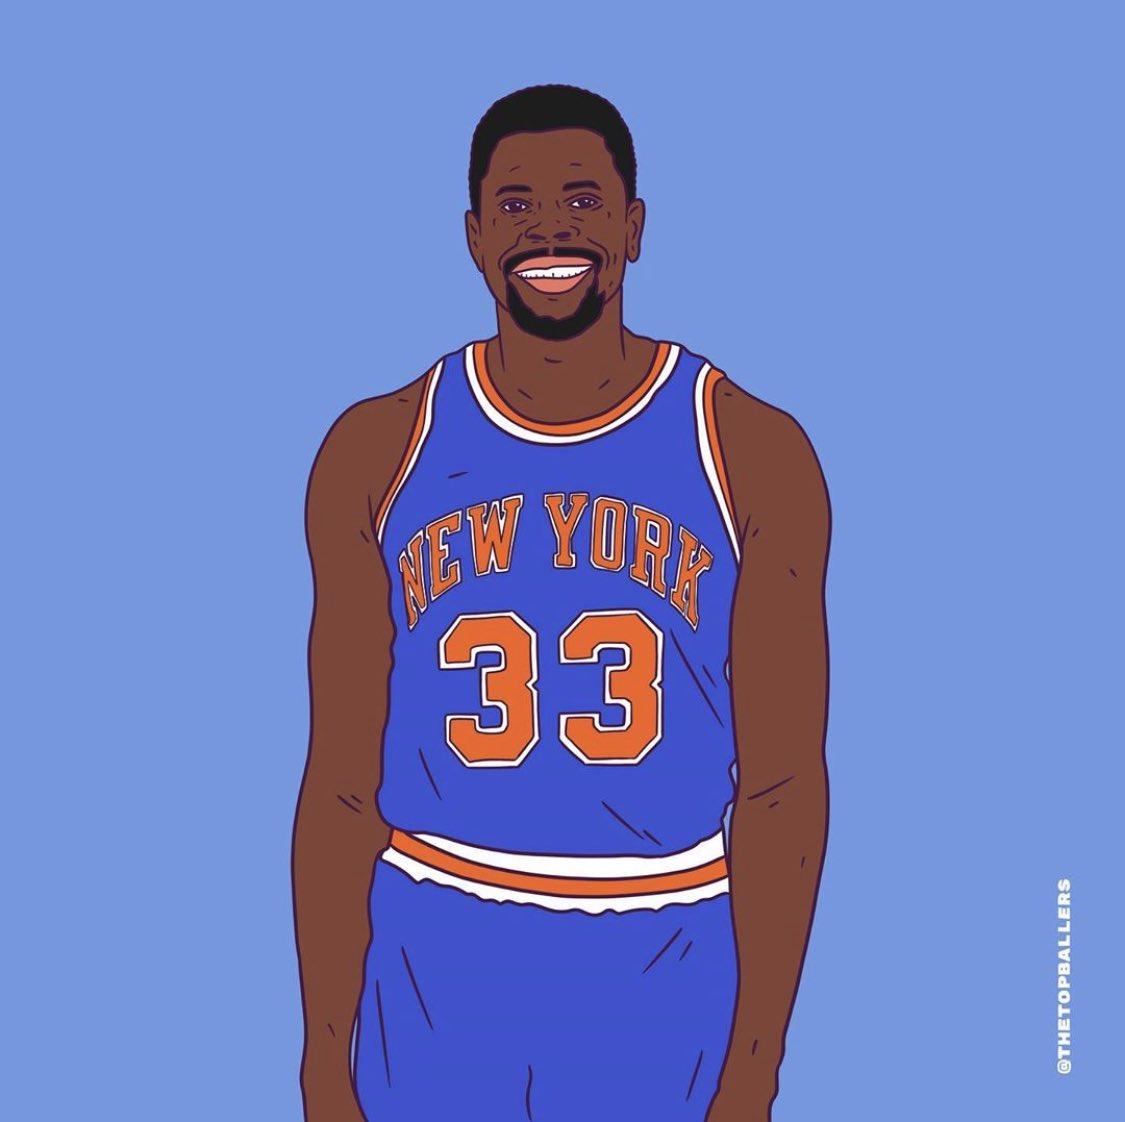 Happy #PatWeek Knicks fans! Watch all week starting now on MSG Network! #NewYorkForever https://t.co/2bLgHSrri2